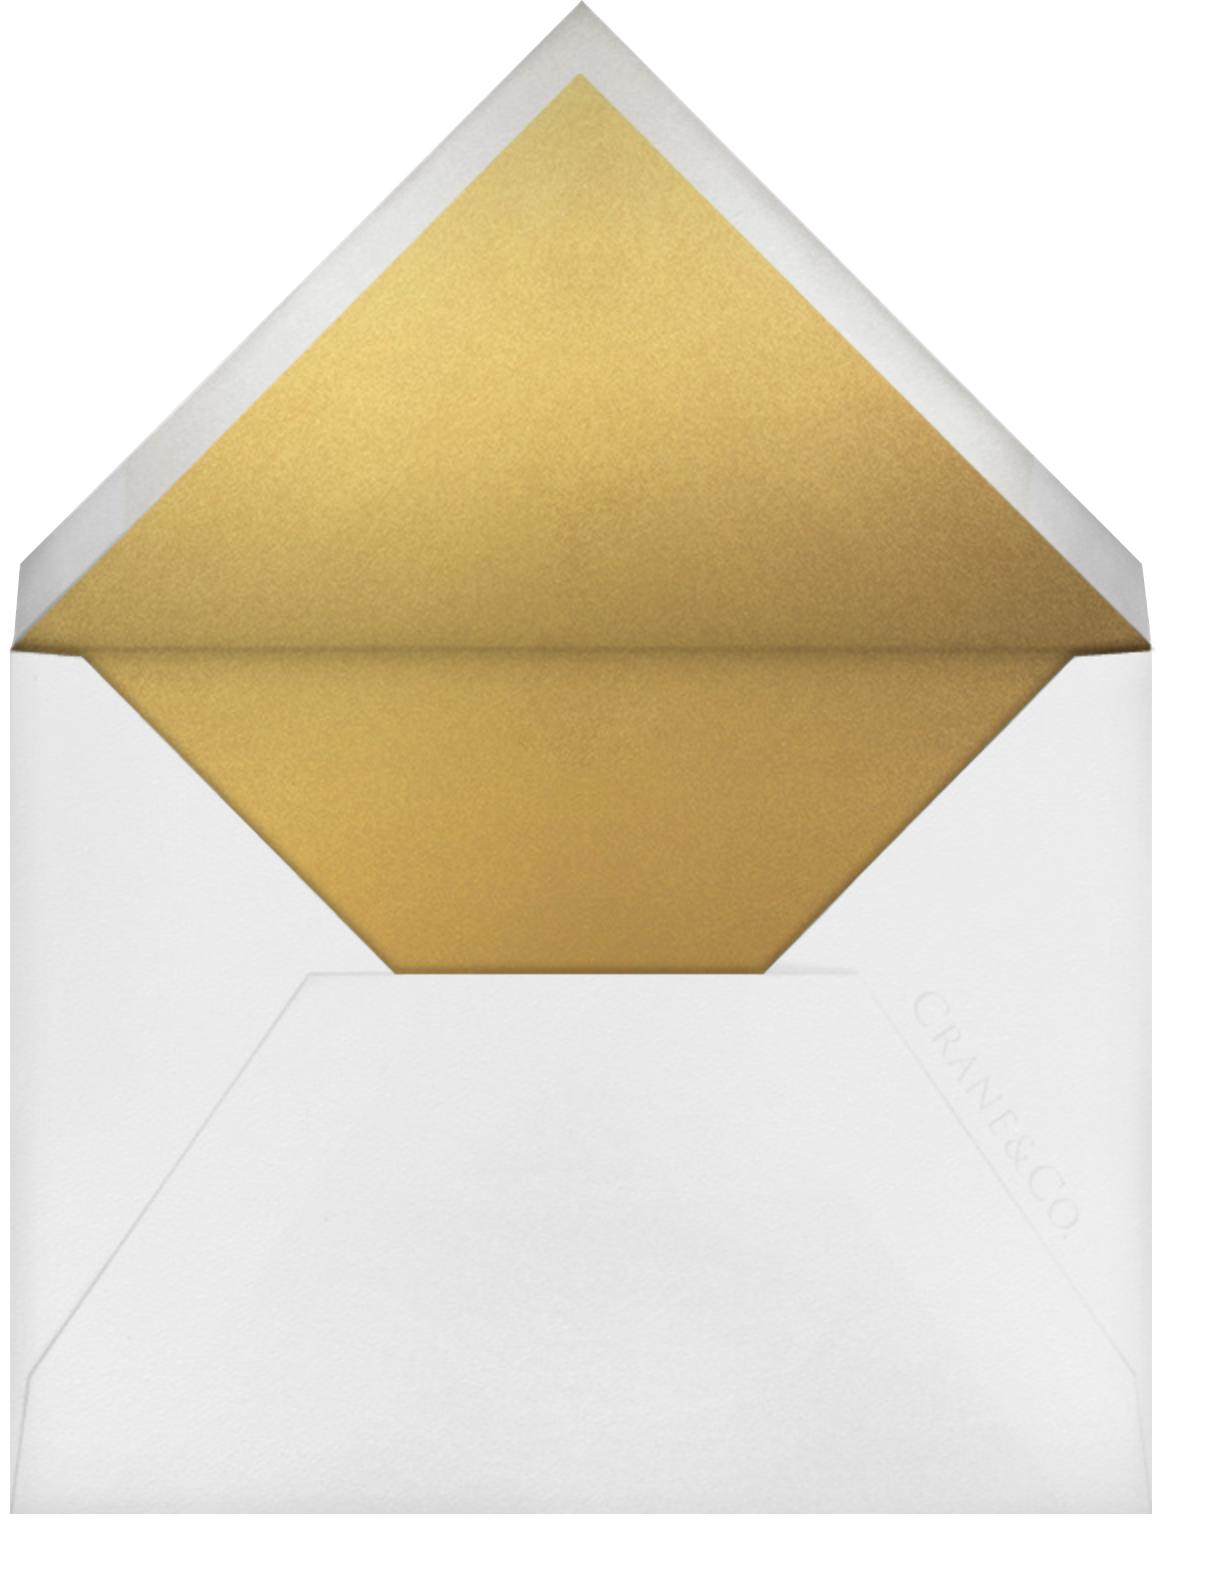 Hanukiah - Paperless Post - Hanukkah - envelope back